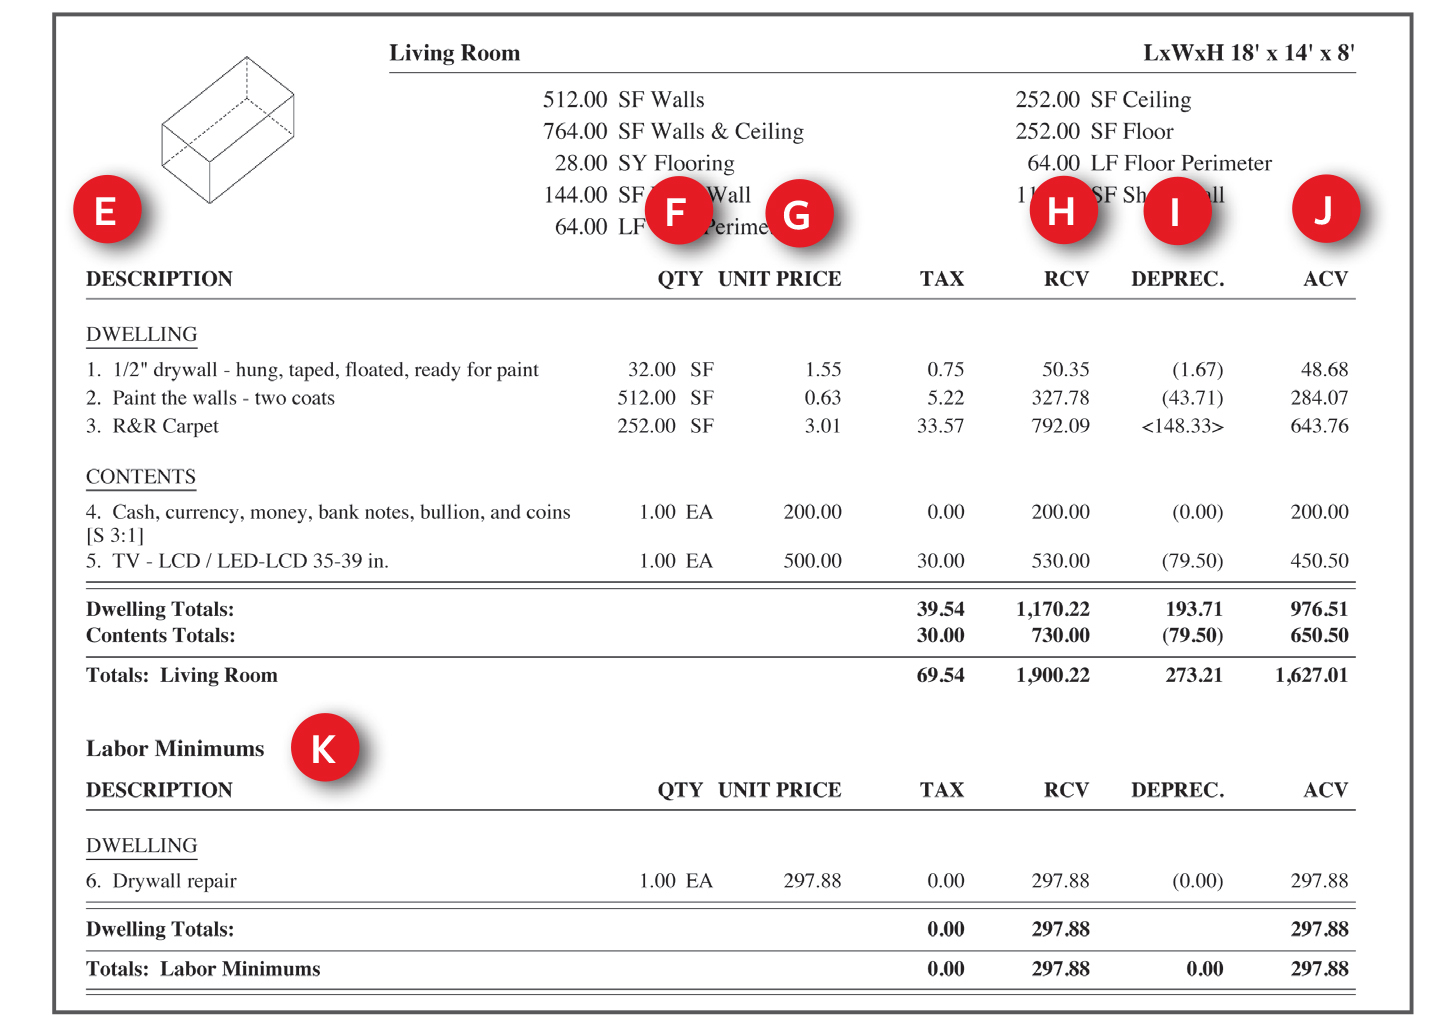 Home Contents Insurance Calculator Spreadsheet With Regard